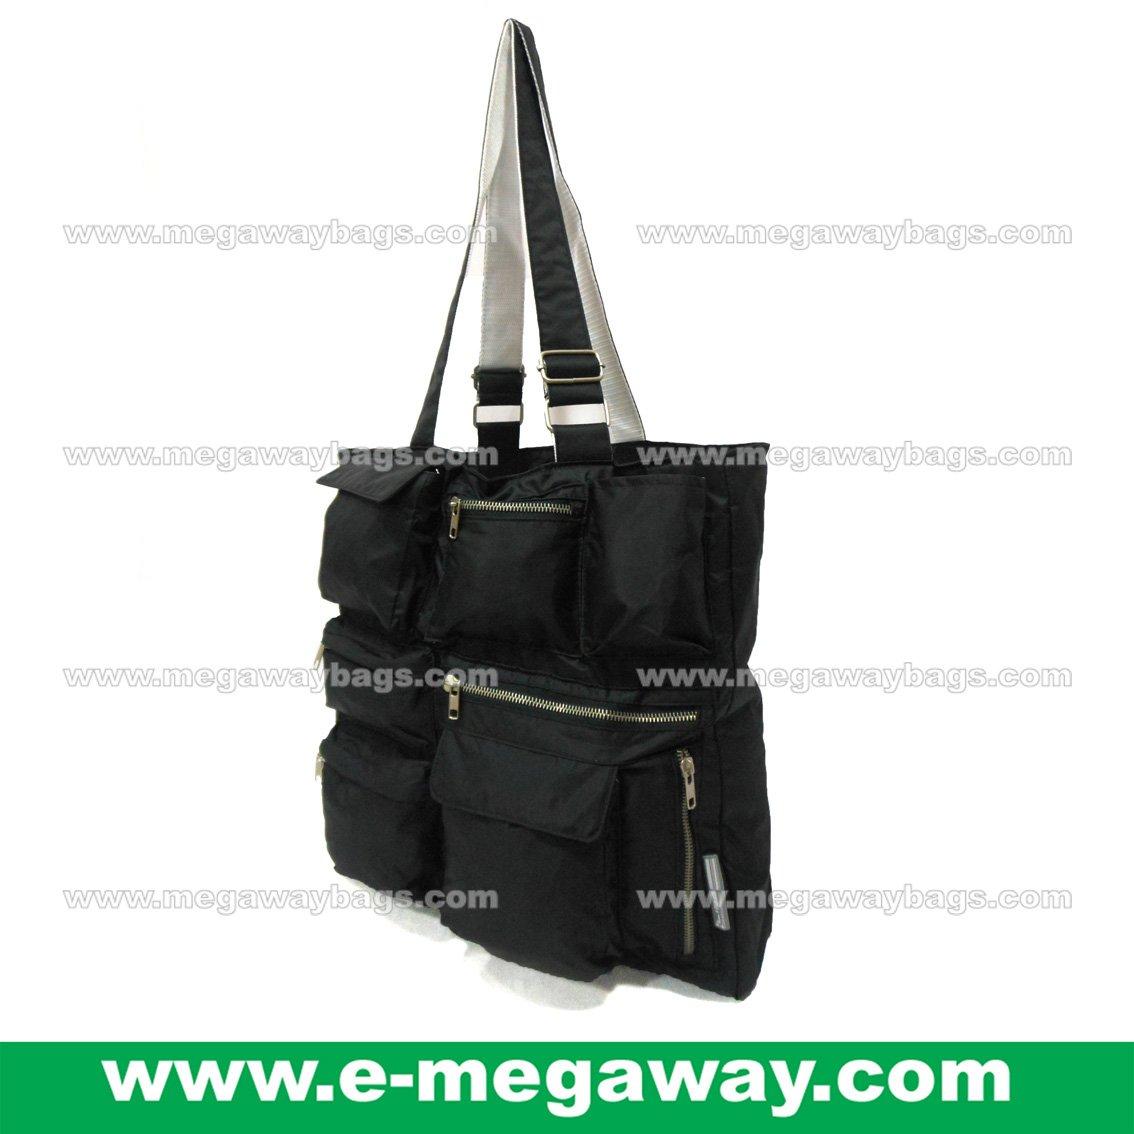 LIPP Tote Bag Fashion Handbag Women Handbag MegawayBags #CC- 0991